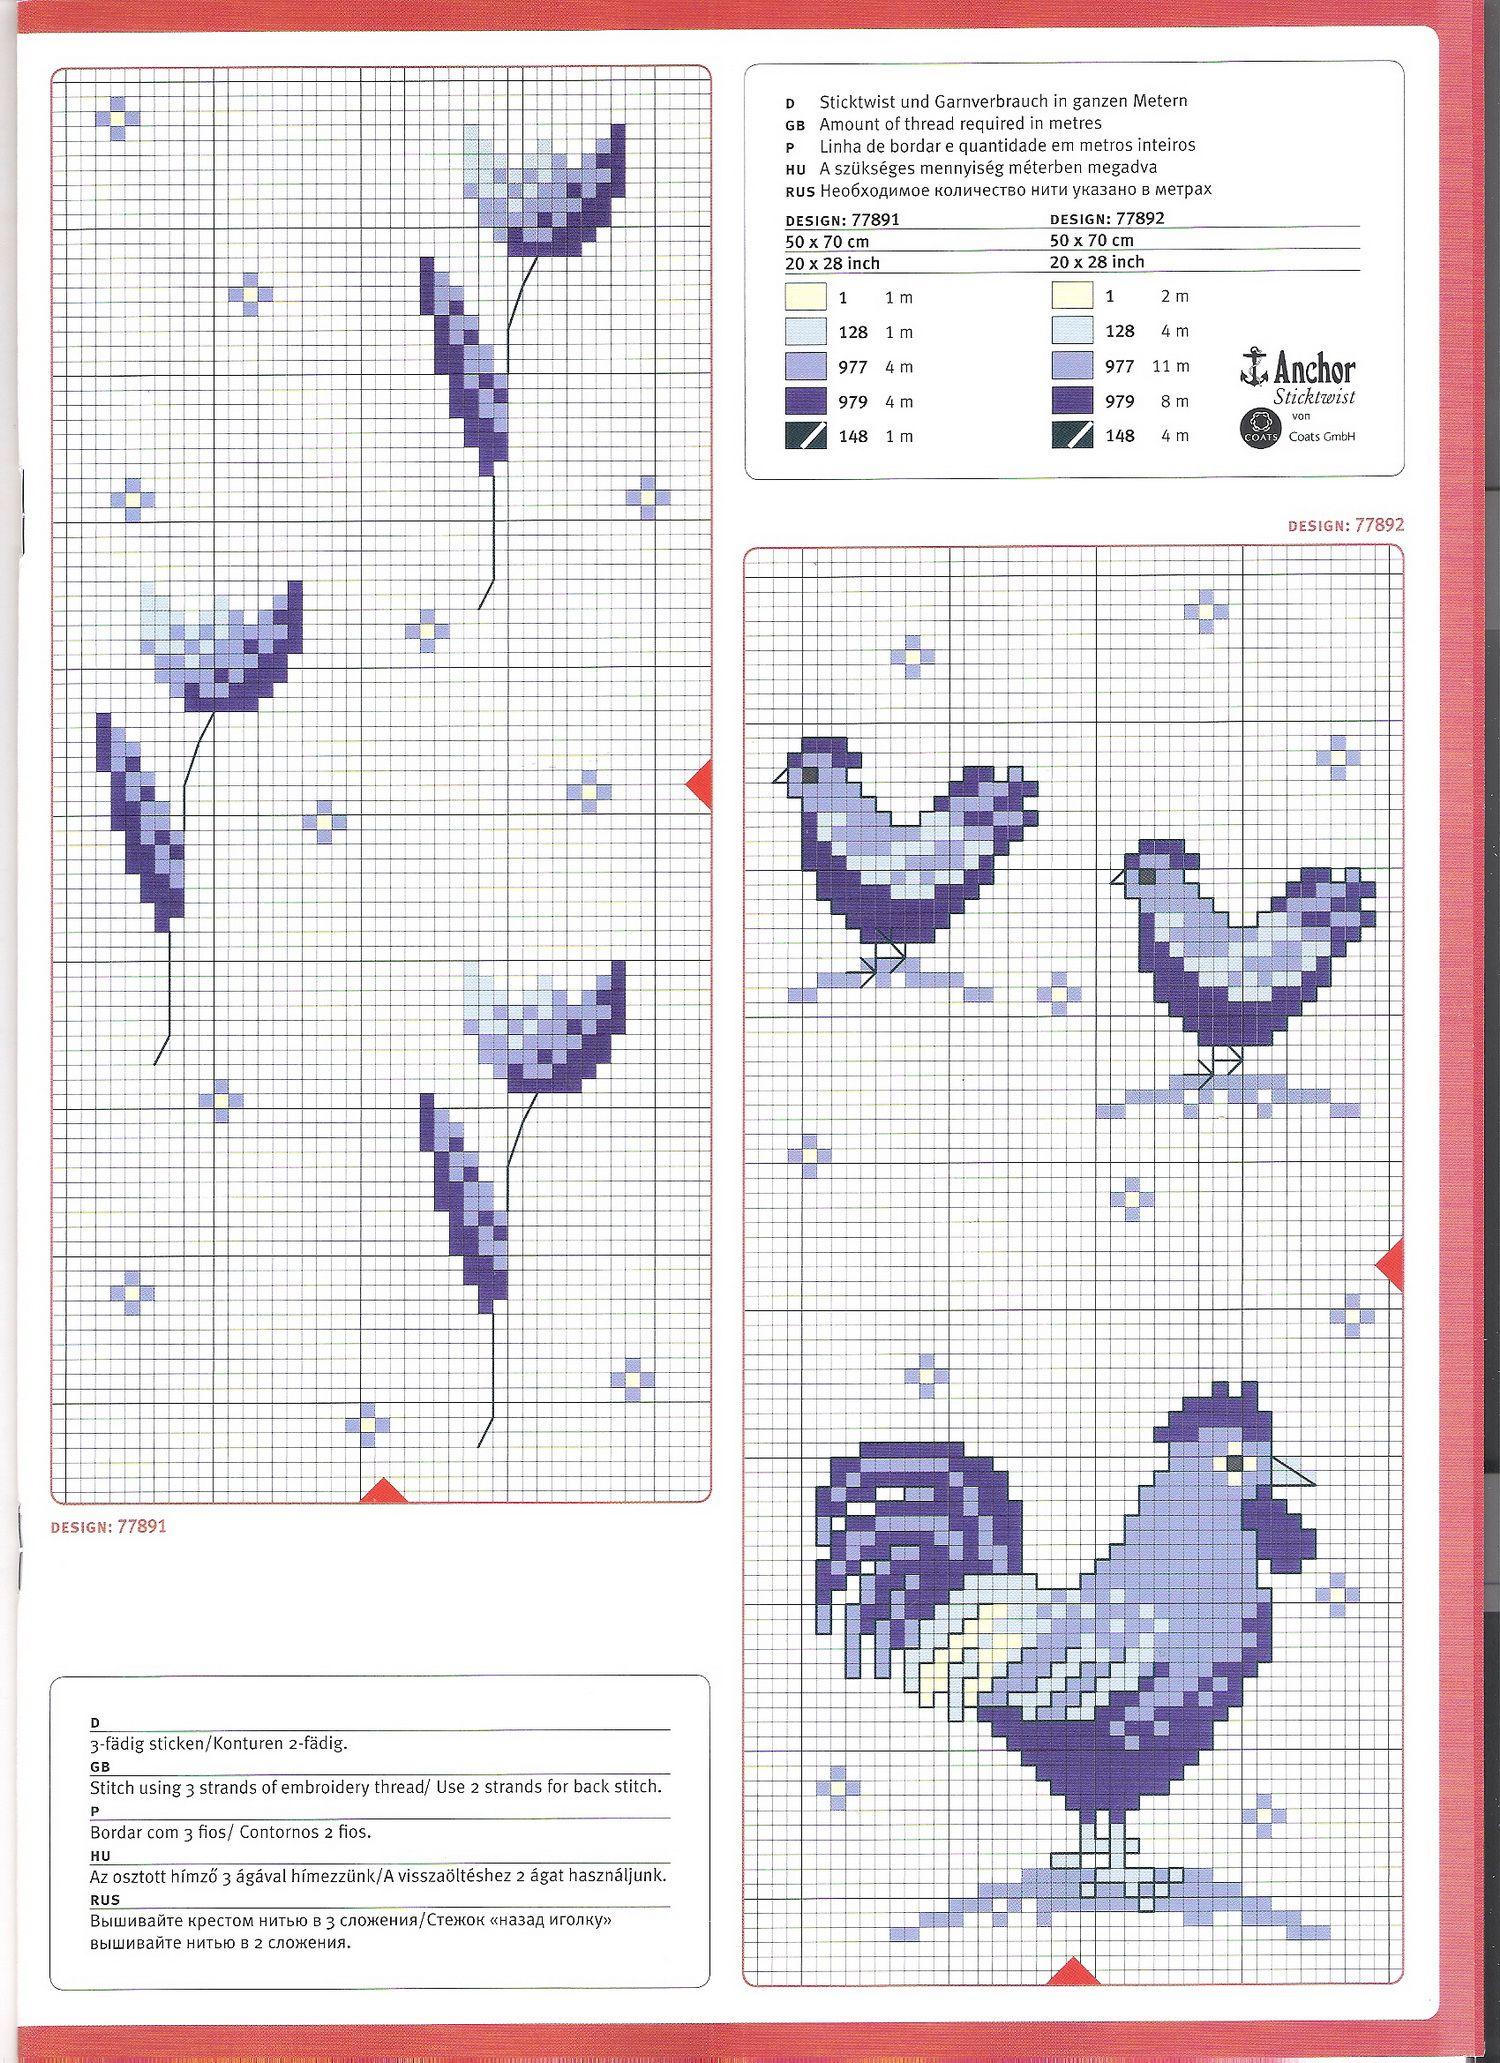 Pin de Marina Cardona Arboleda en Punto cruz gallos | Pinterest ...